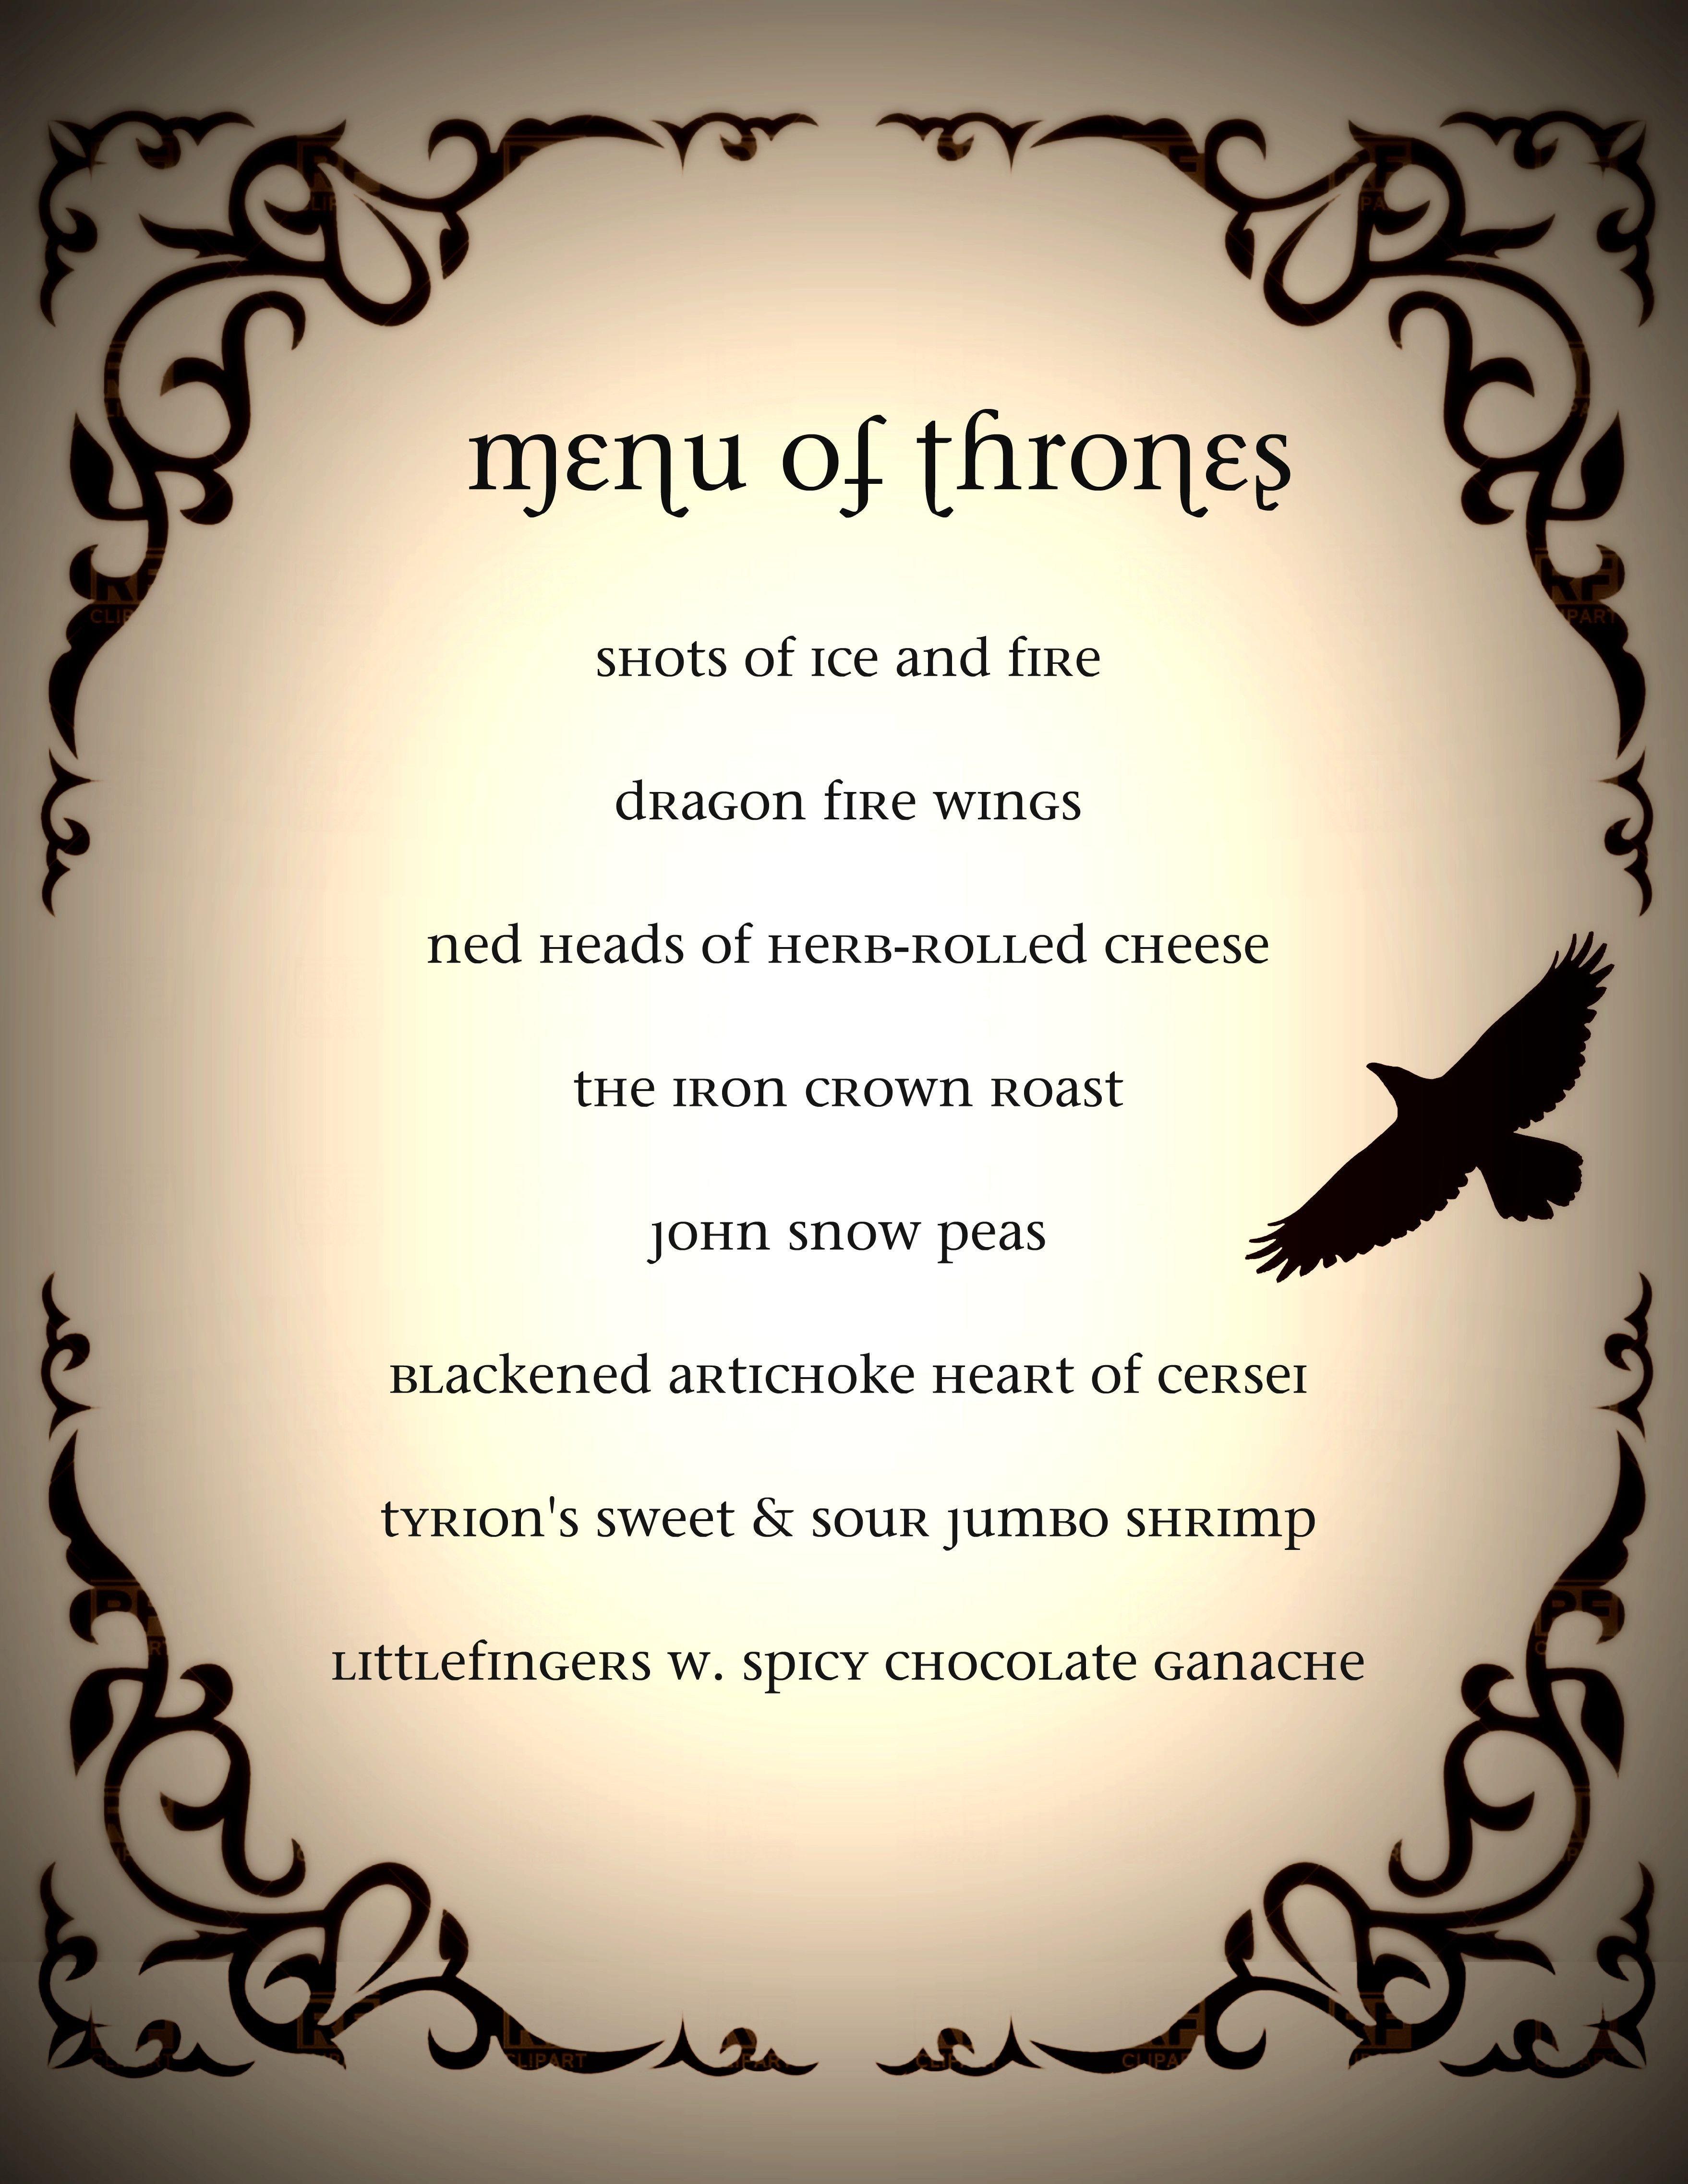 Game Of Thrones Menu Template Game Of Thrones Dinner Party Menu Got